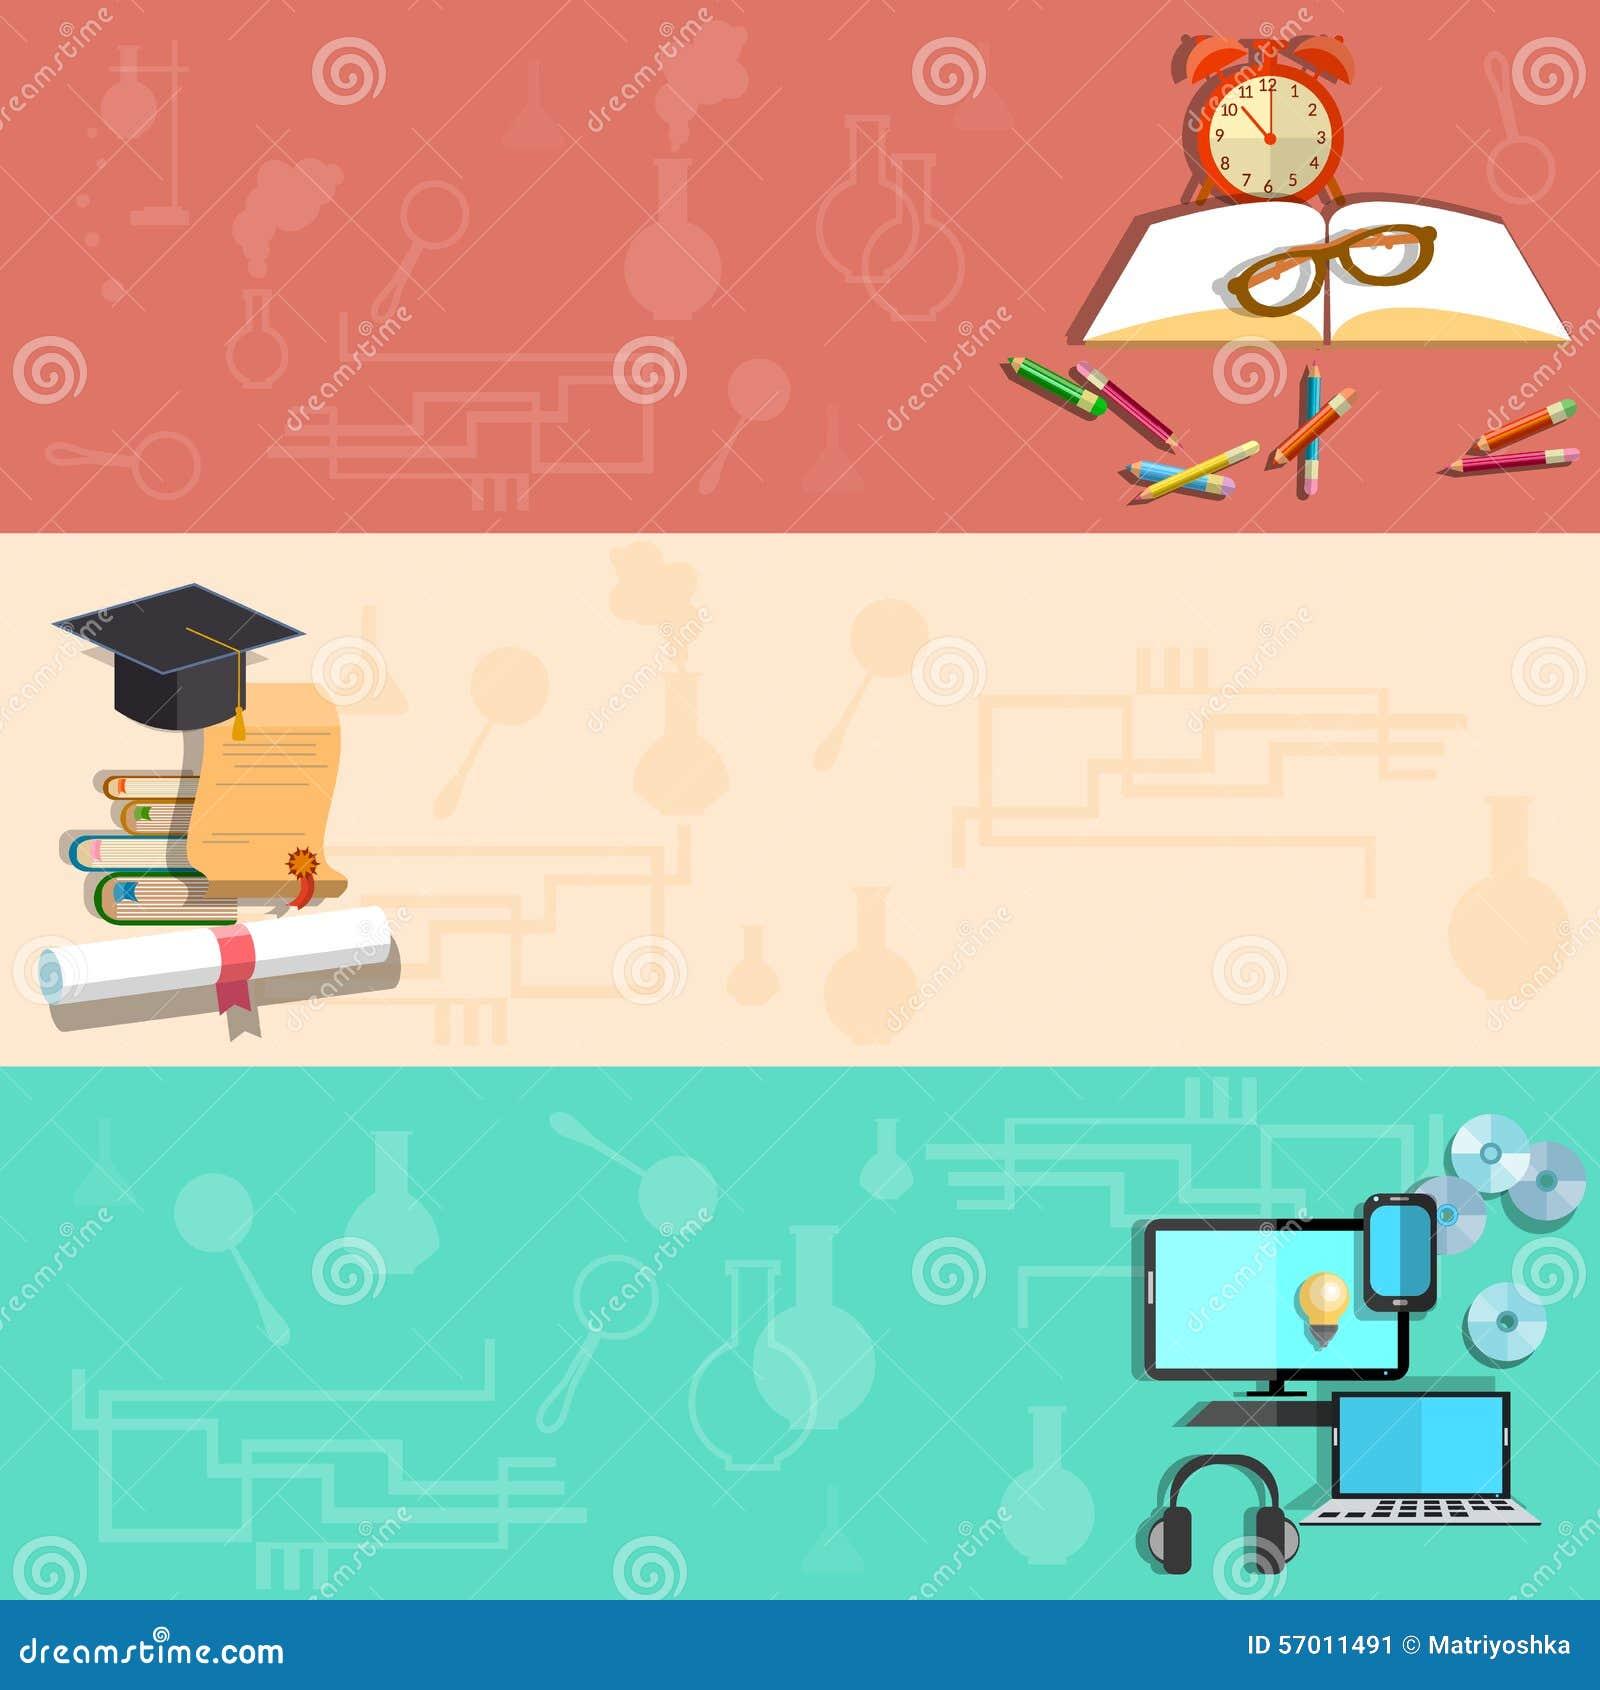 Web Design subject of university